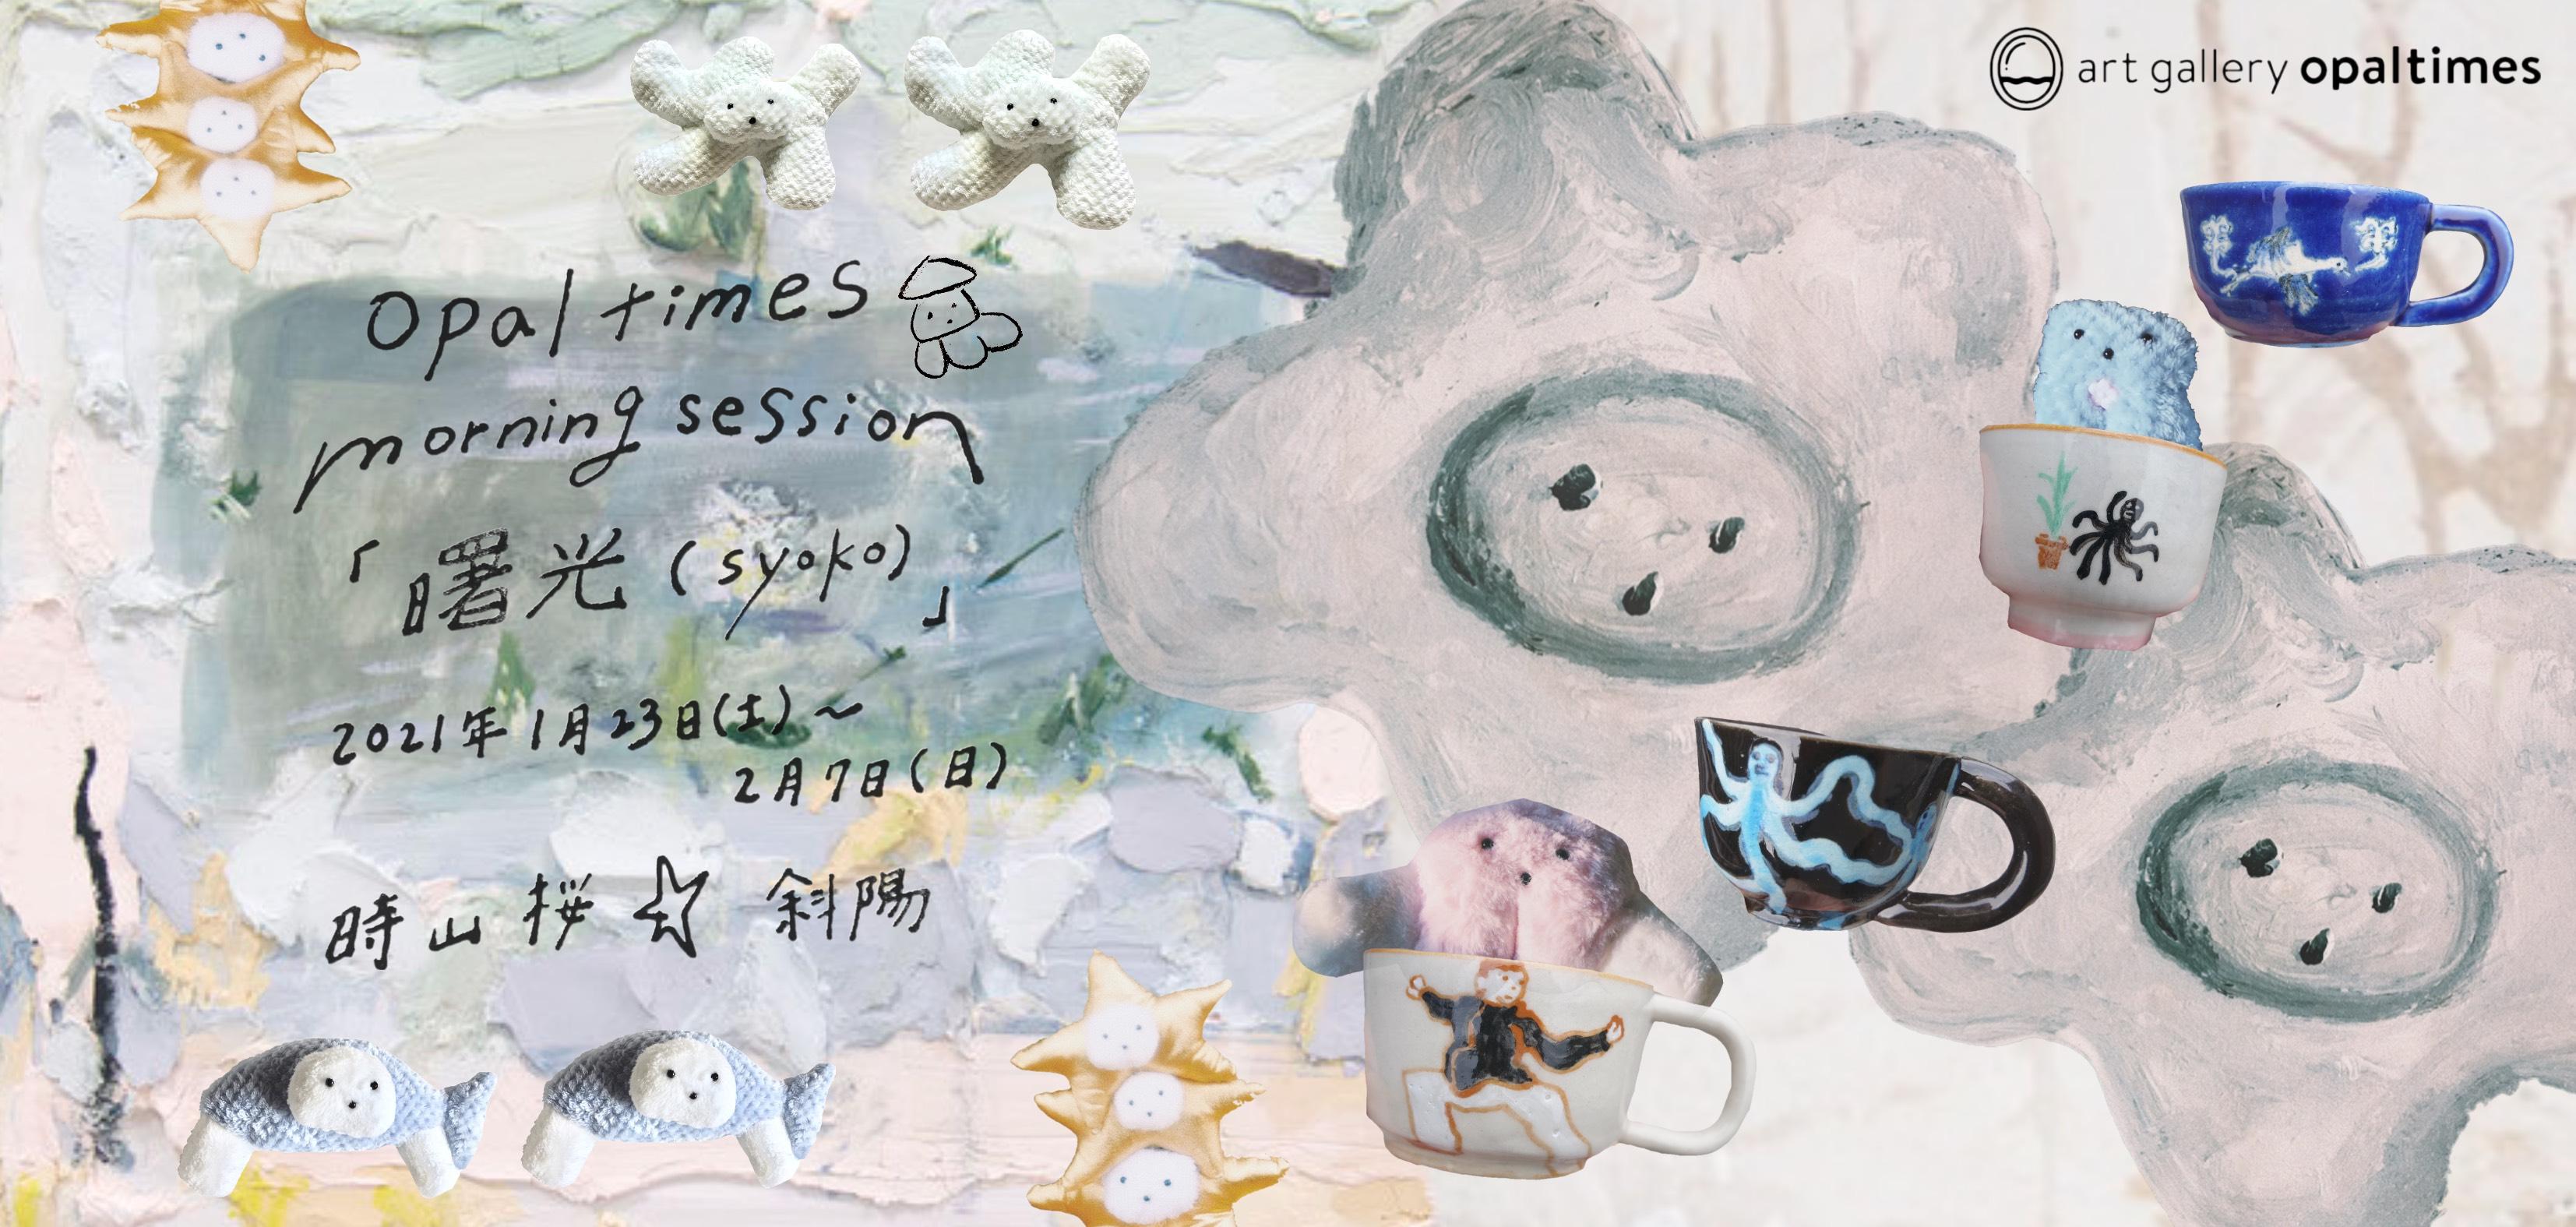 opaltimes morning session「曙光(syoko)」